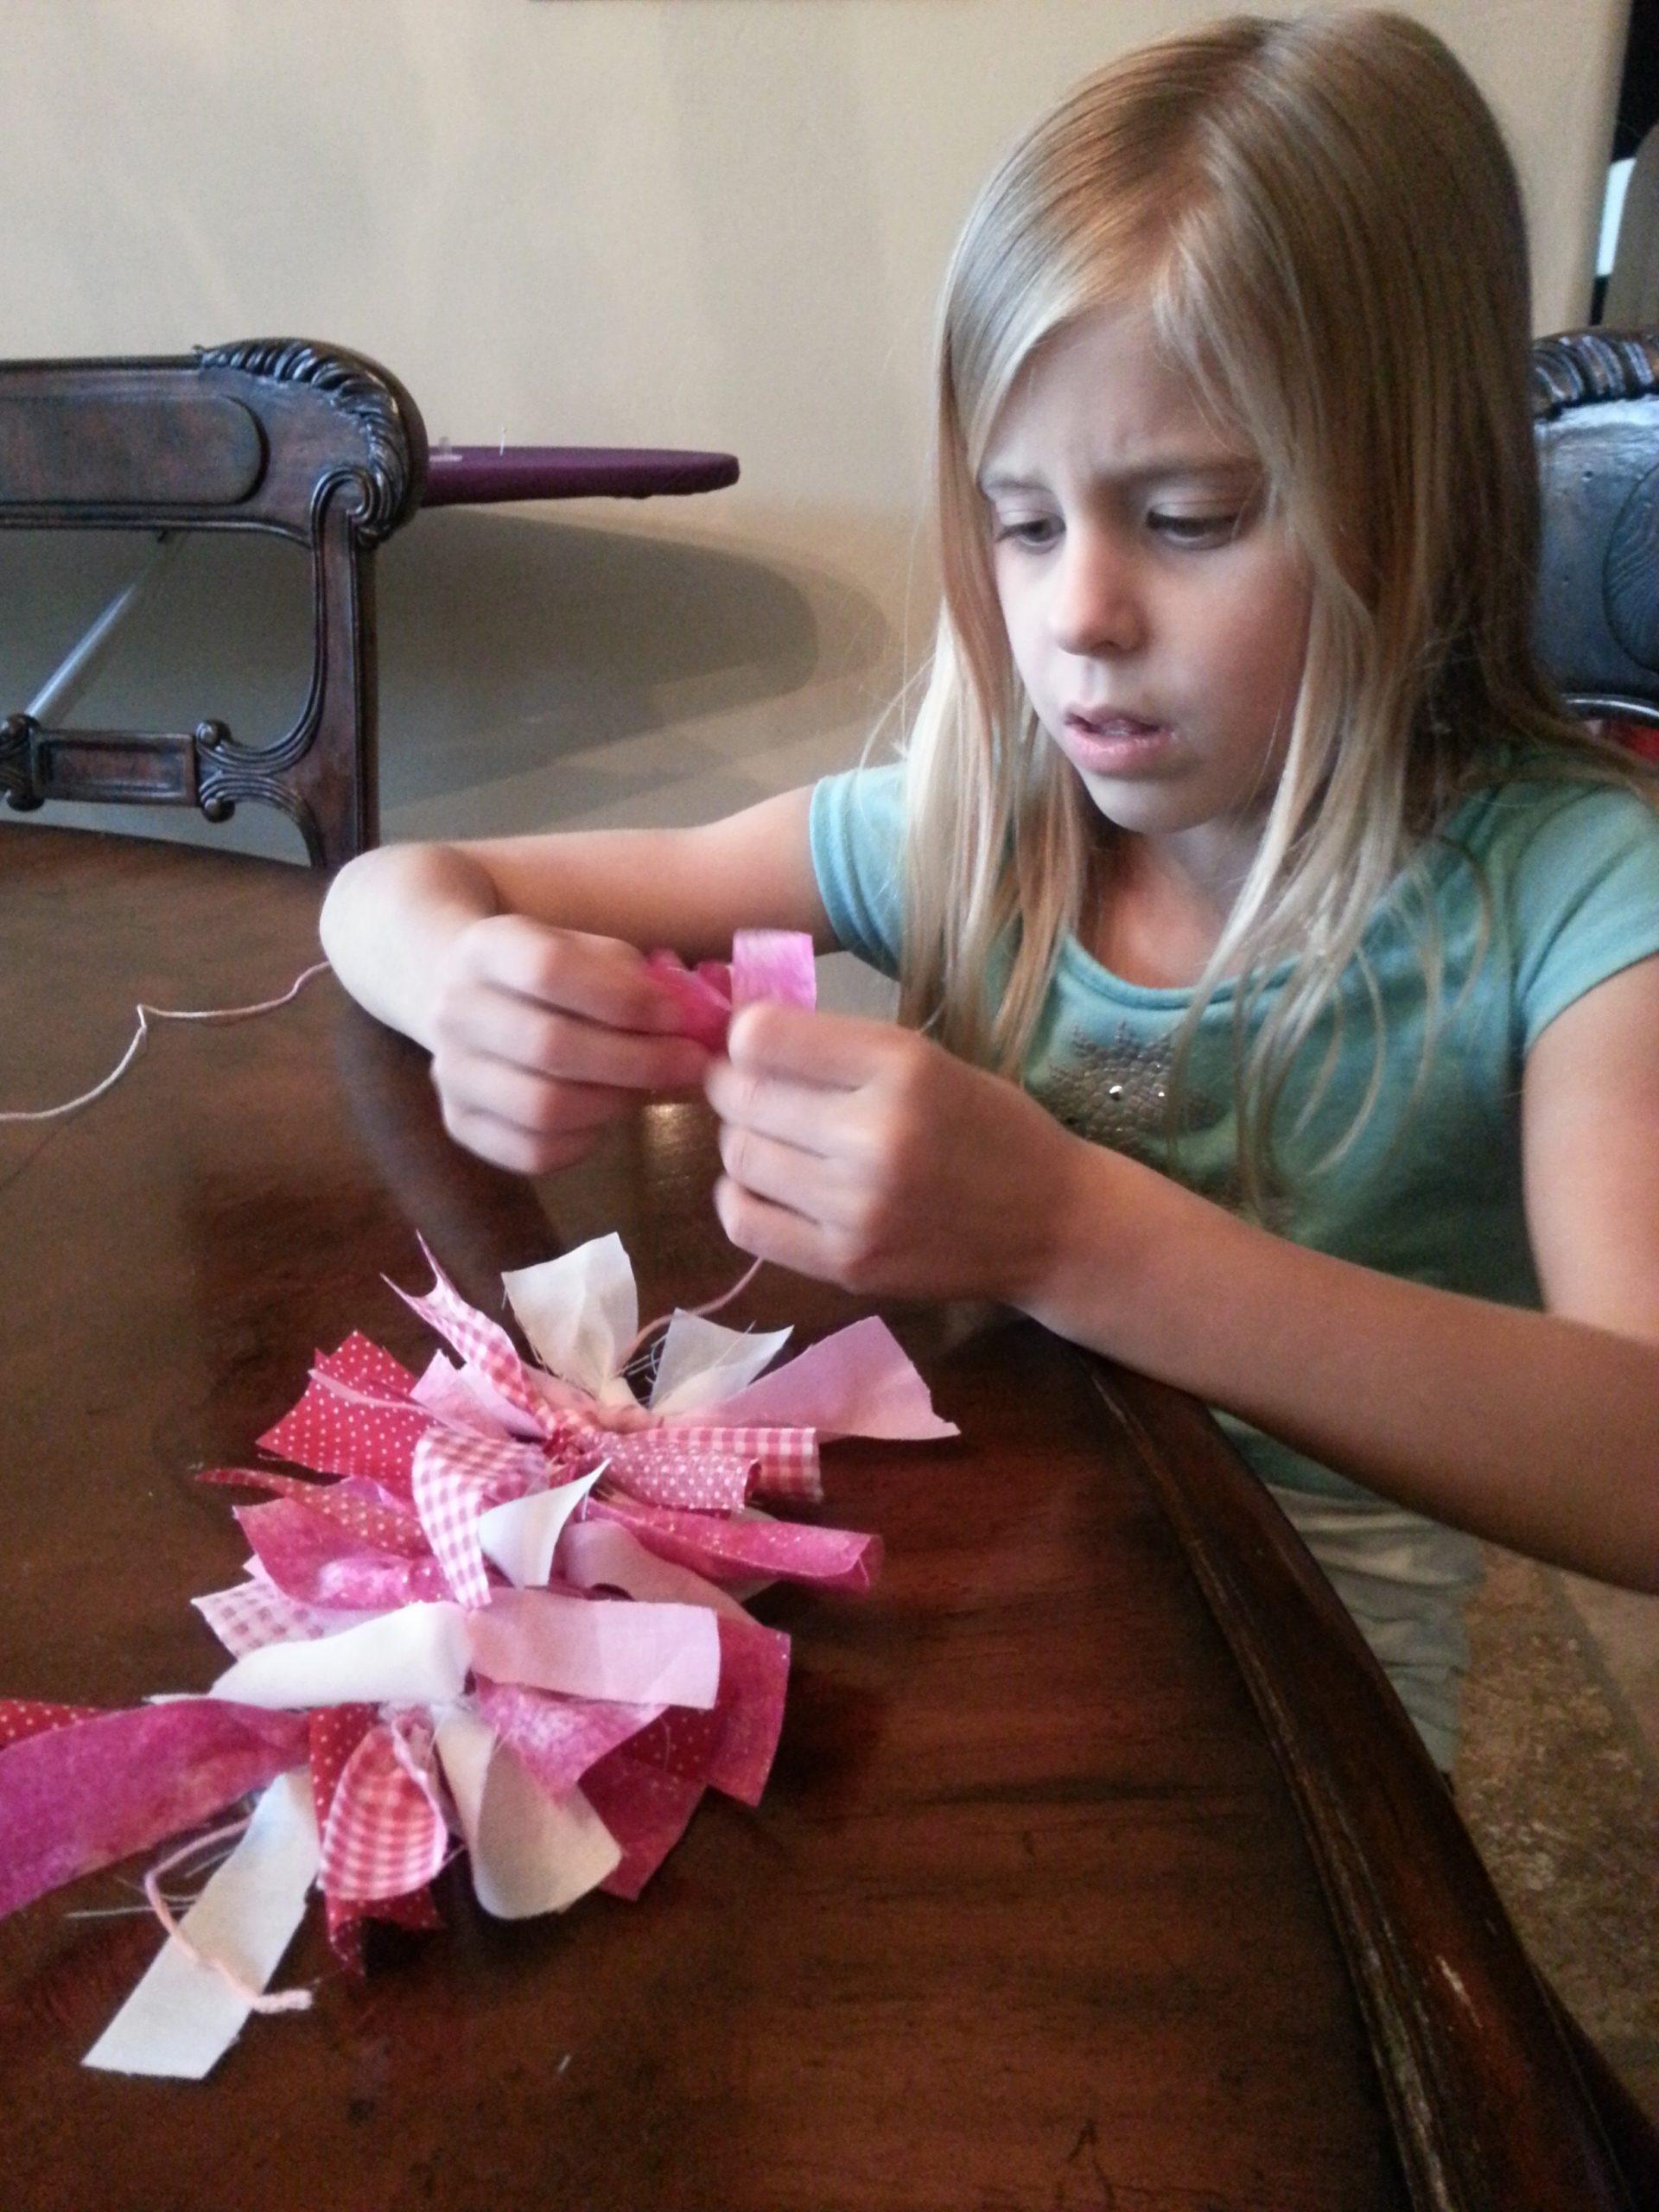 #PowellPack #ValentinesDay #Craft #HeartWreath #HeidiPowell